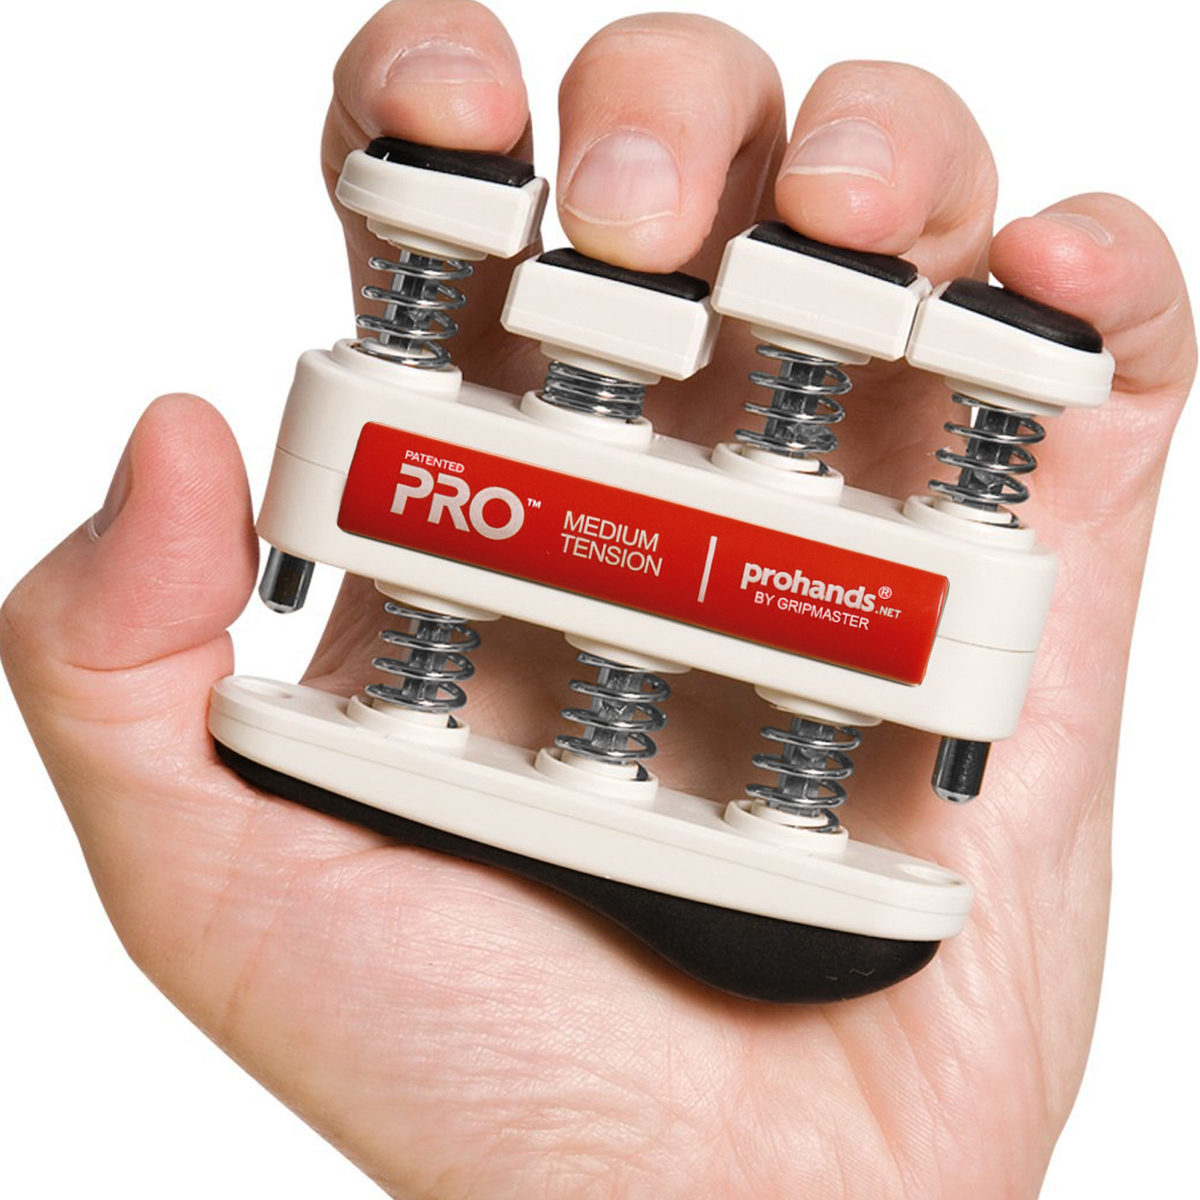 Gripmaster-Pro-Hand-and-Finger-Exerciser-Choose-from-5-grip-strengthener-levels thumbnail 11